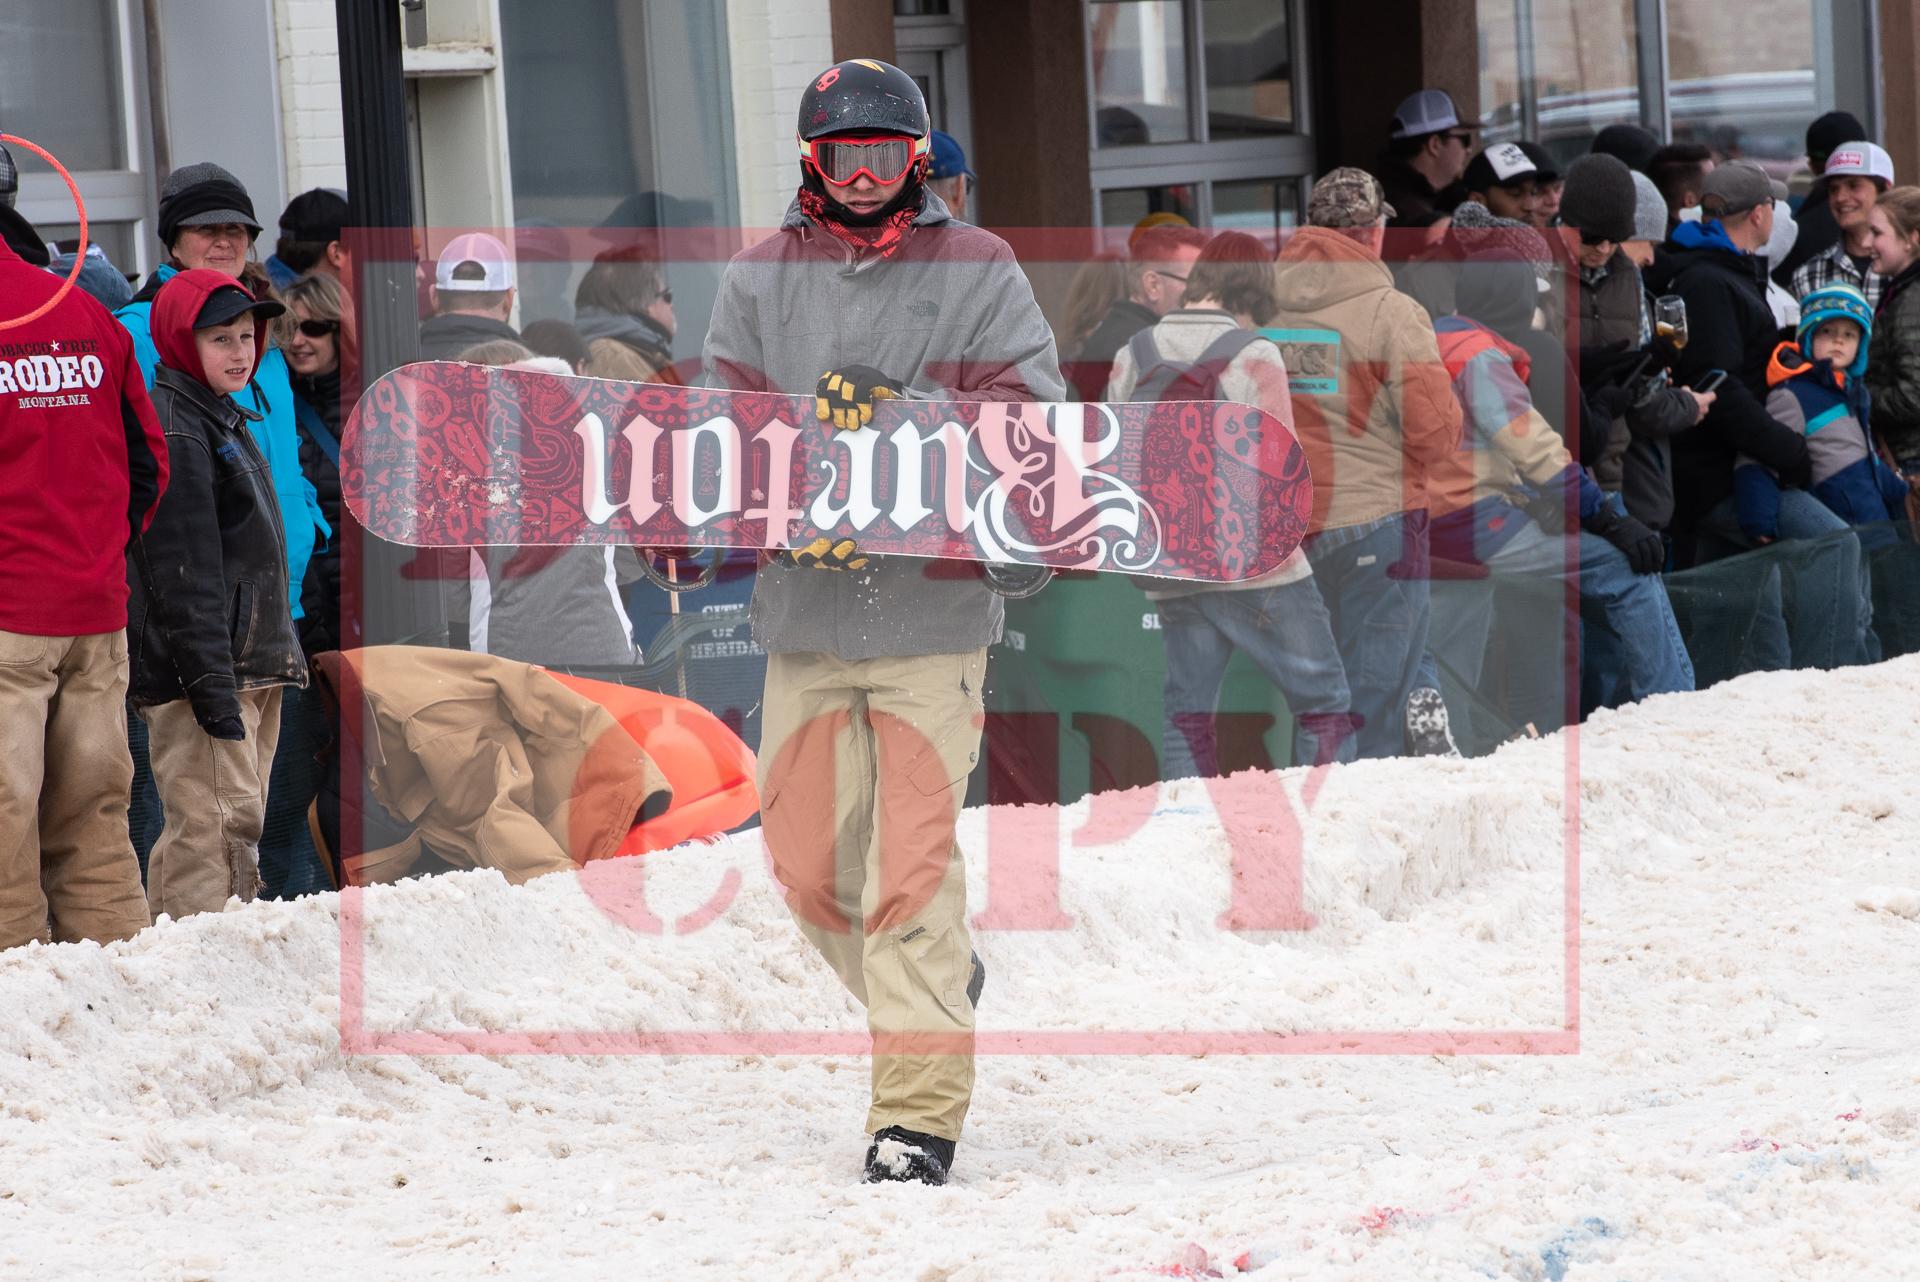 - Taylor Townsend - Snowboard 4